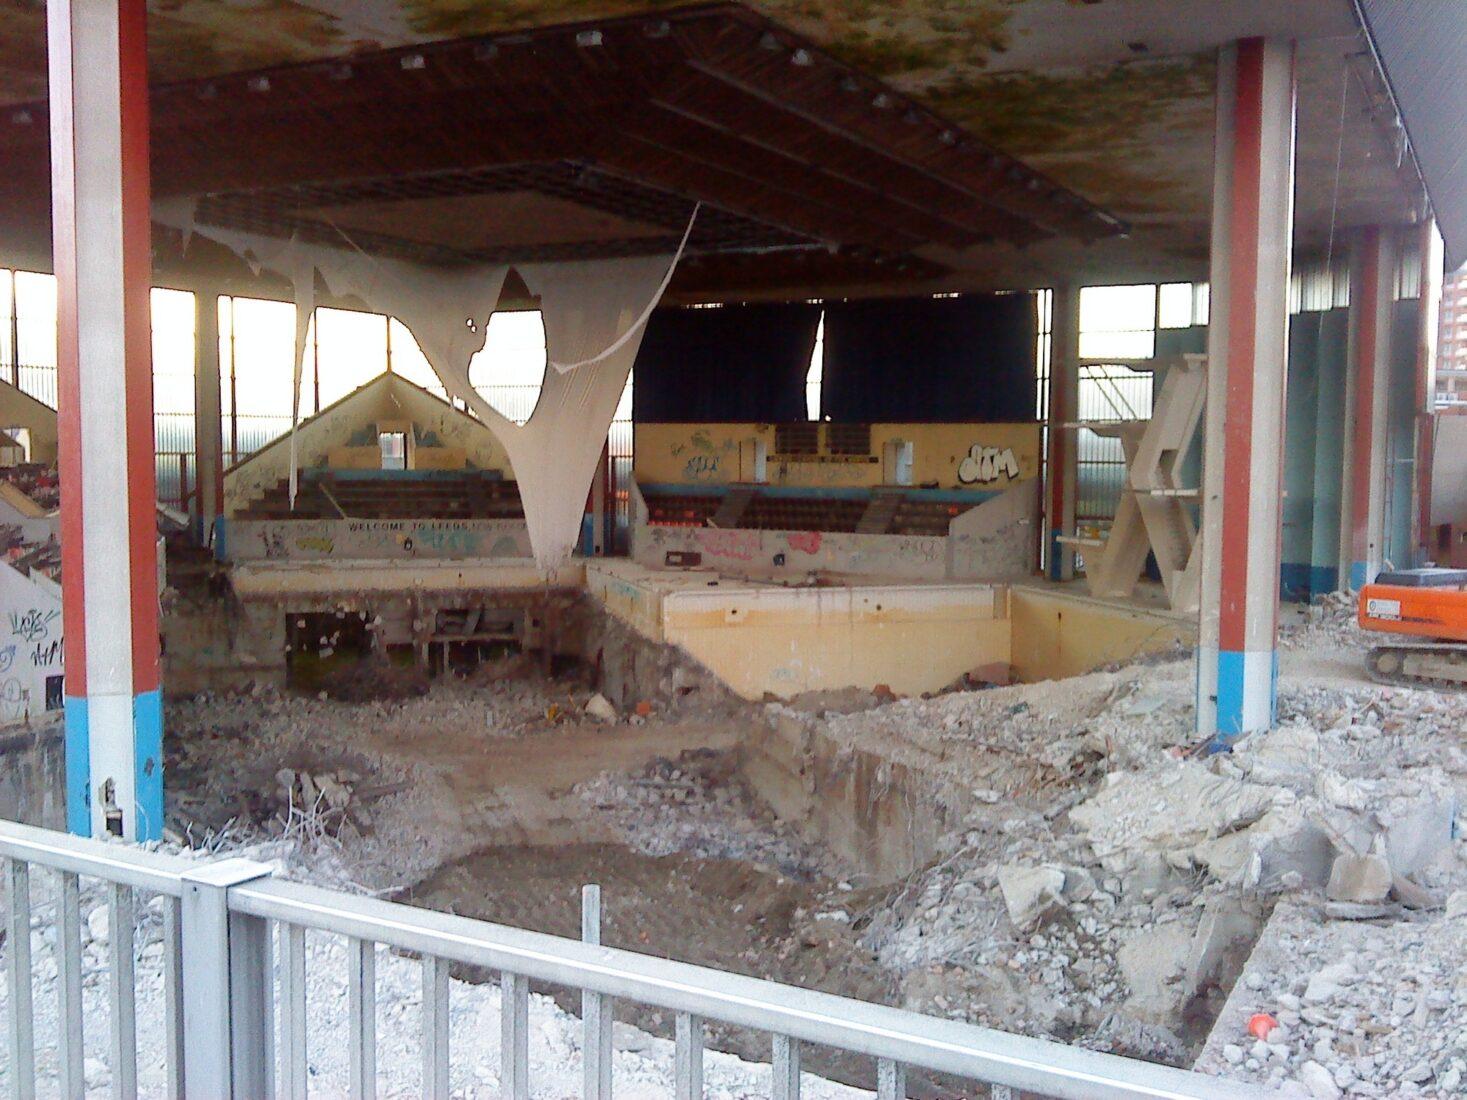 Leeds Pool Demolition Continues As Development Plans Abandoned